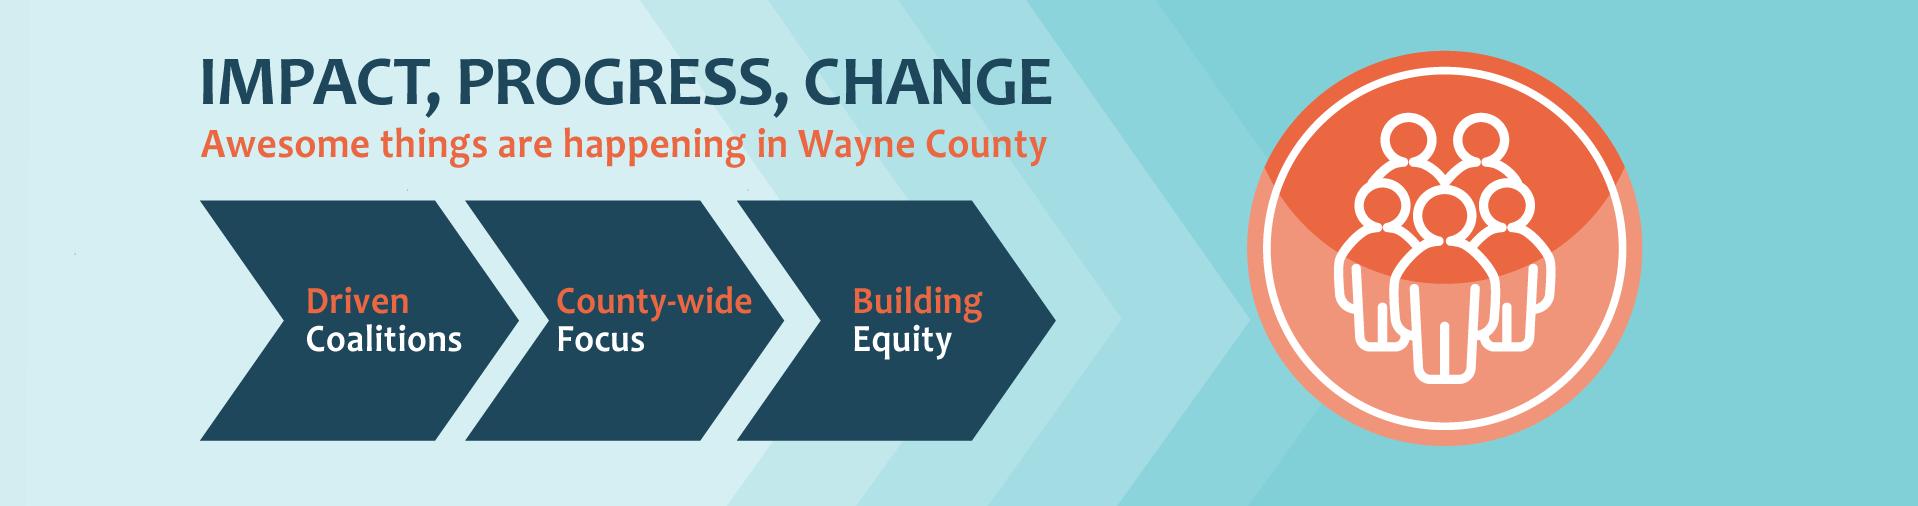 Wayne County Community Impact